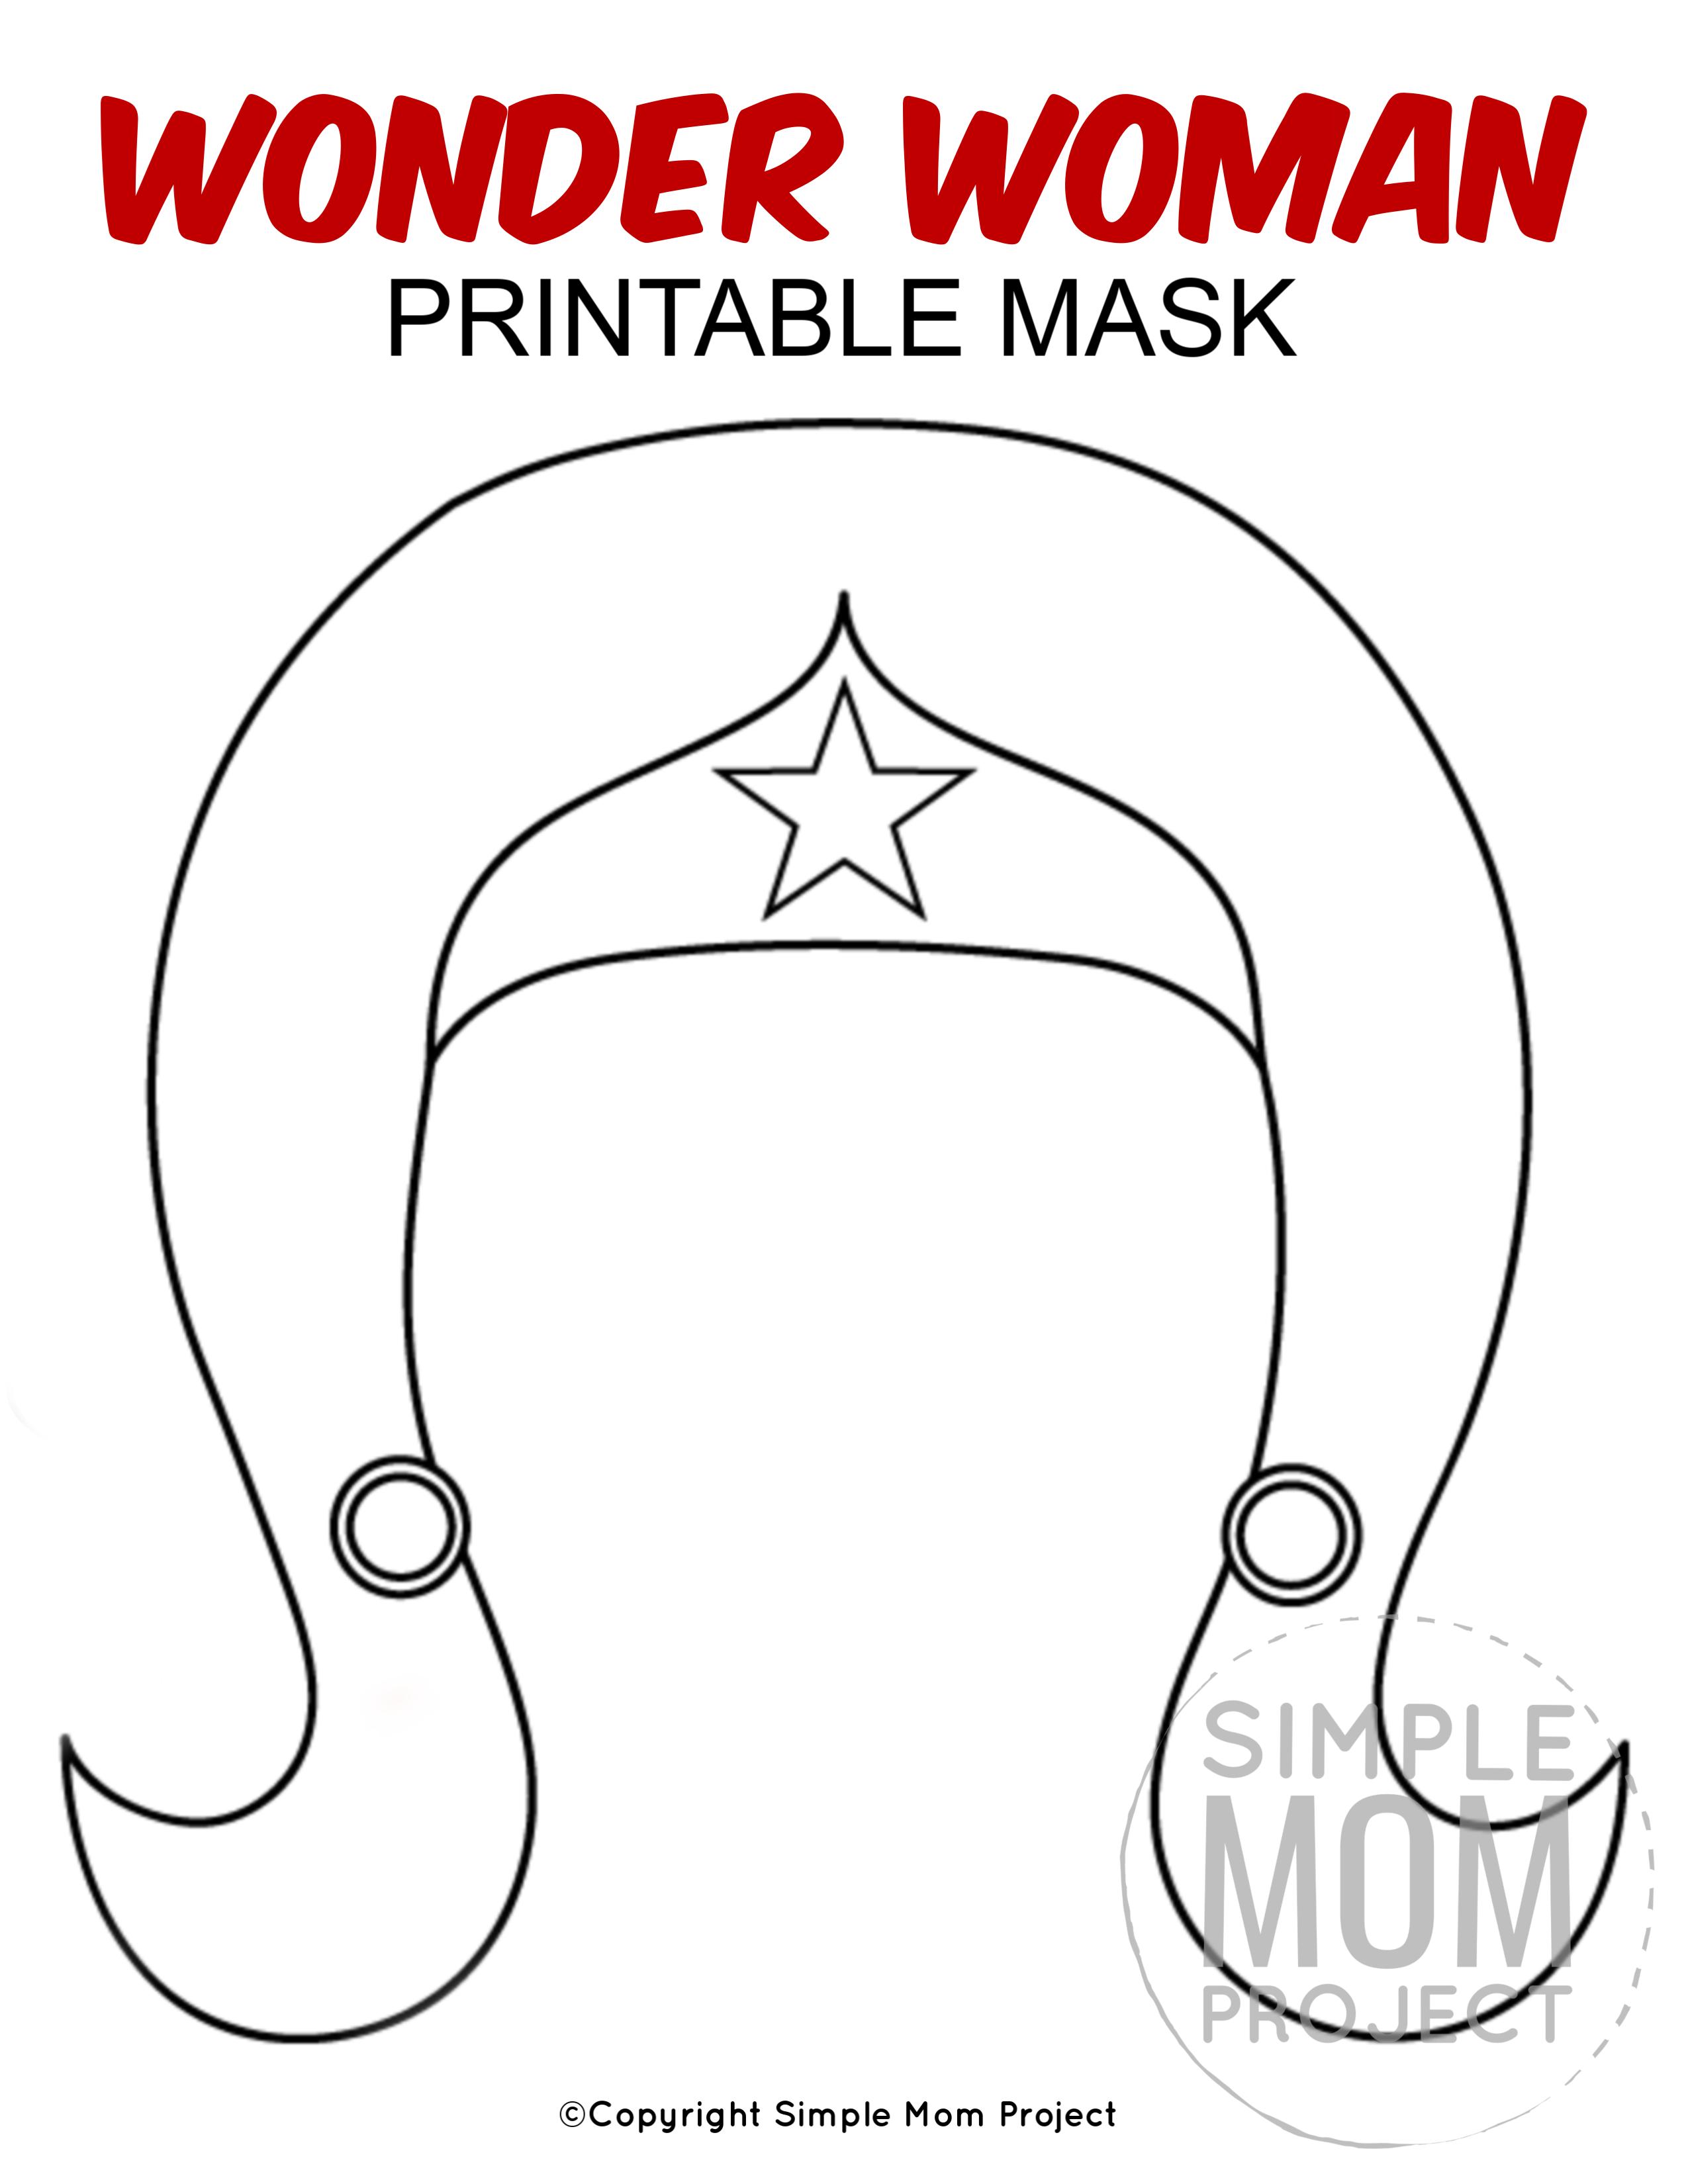 Free Printable Wonder Woman Mask Template Mask Template Superhero Mask Template Wonder Woman Mask